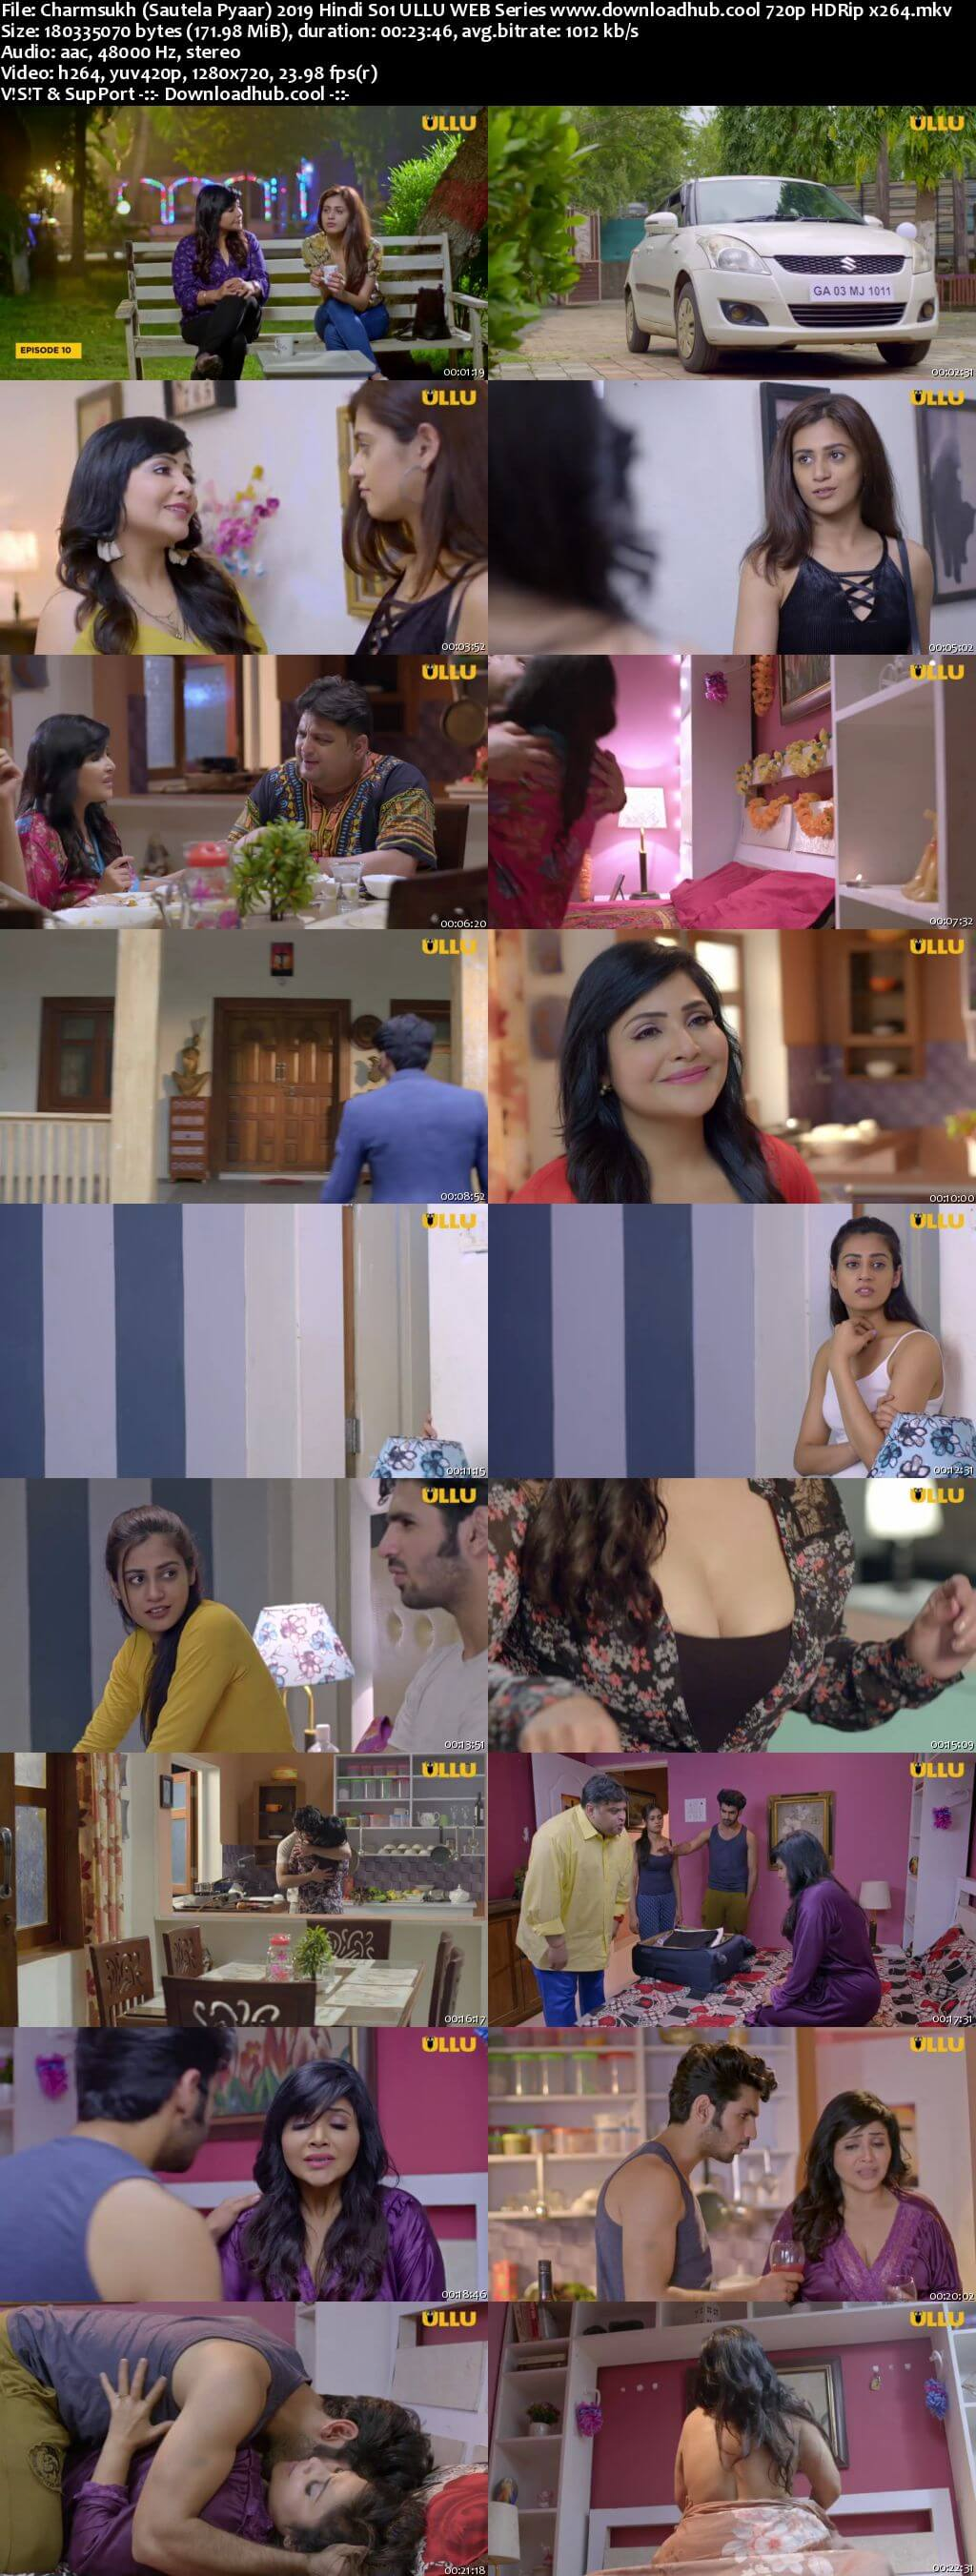 Charmsukh (Sautela Pyaar) 2019 Hindi S01 ULLU WEB Series 720p HDRip x264